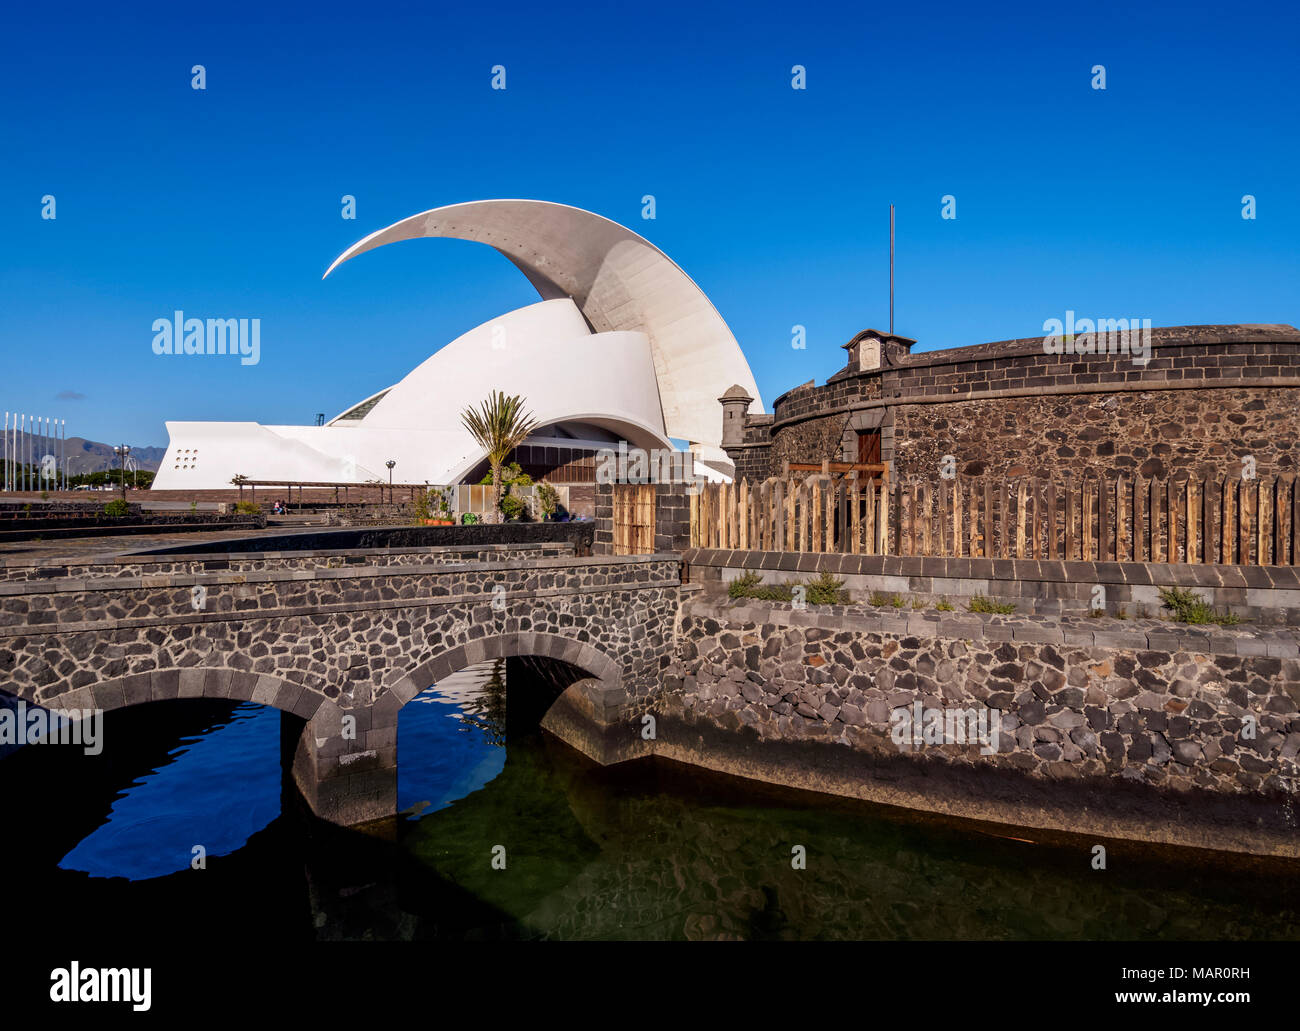 Castle of San Juan Bautista and Auditorium Adan Martin, Santa Cruz de Tenerife, Tenerife Island, Canary Islands, Spain, Europe - Stock Image